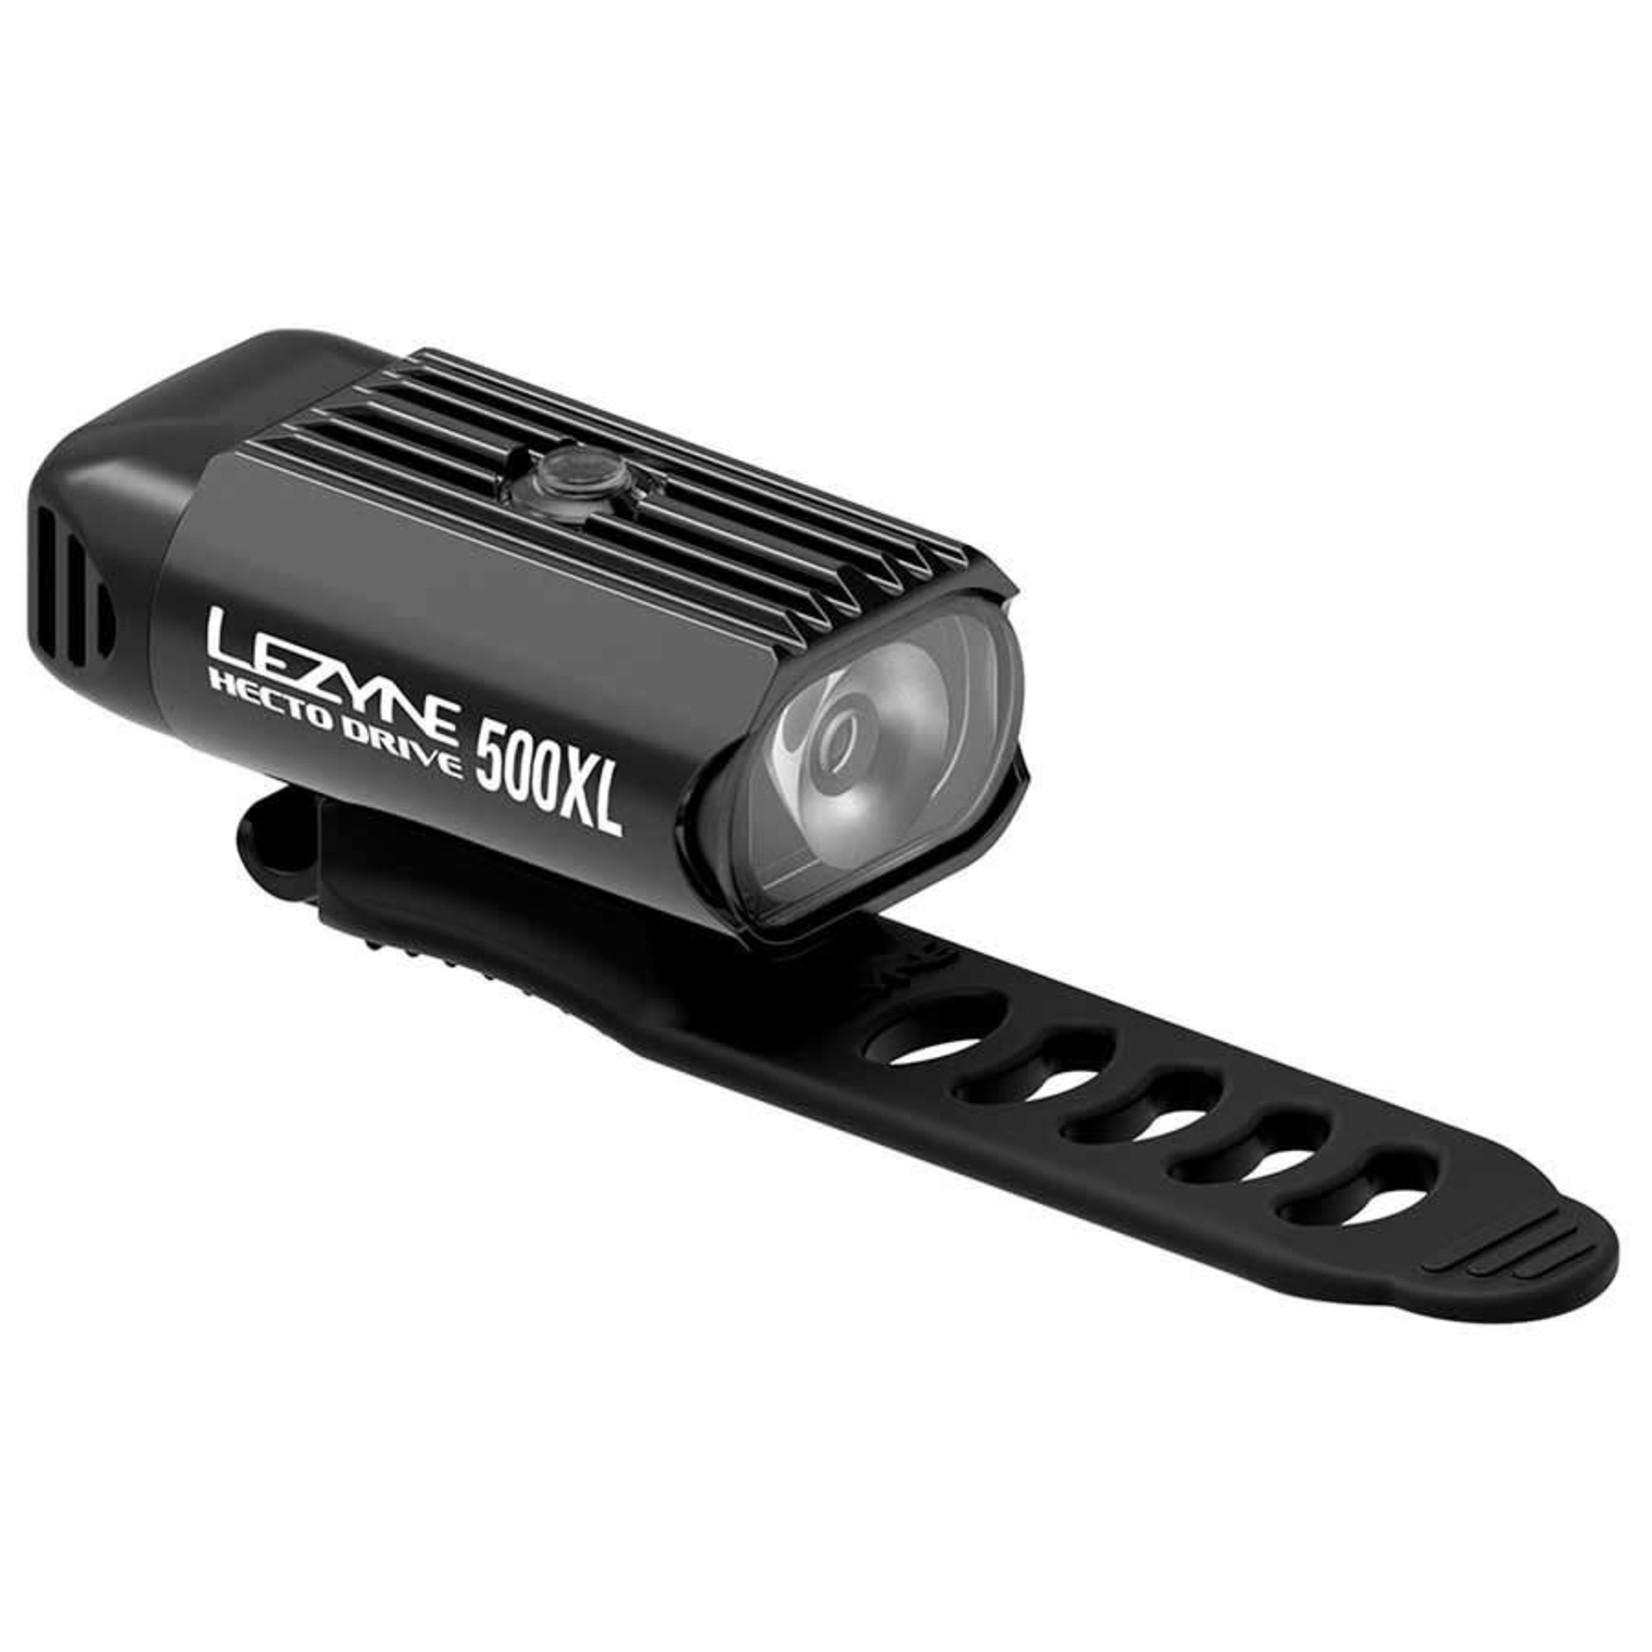 Lezyne Lezyne Hecto Drive 500XL Headlight